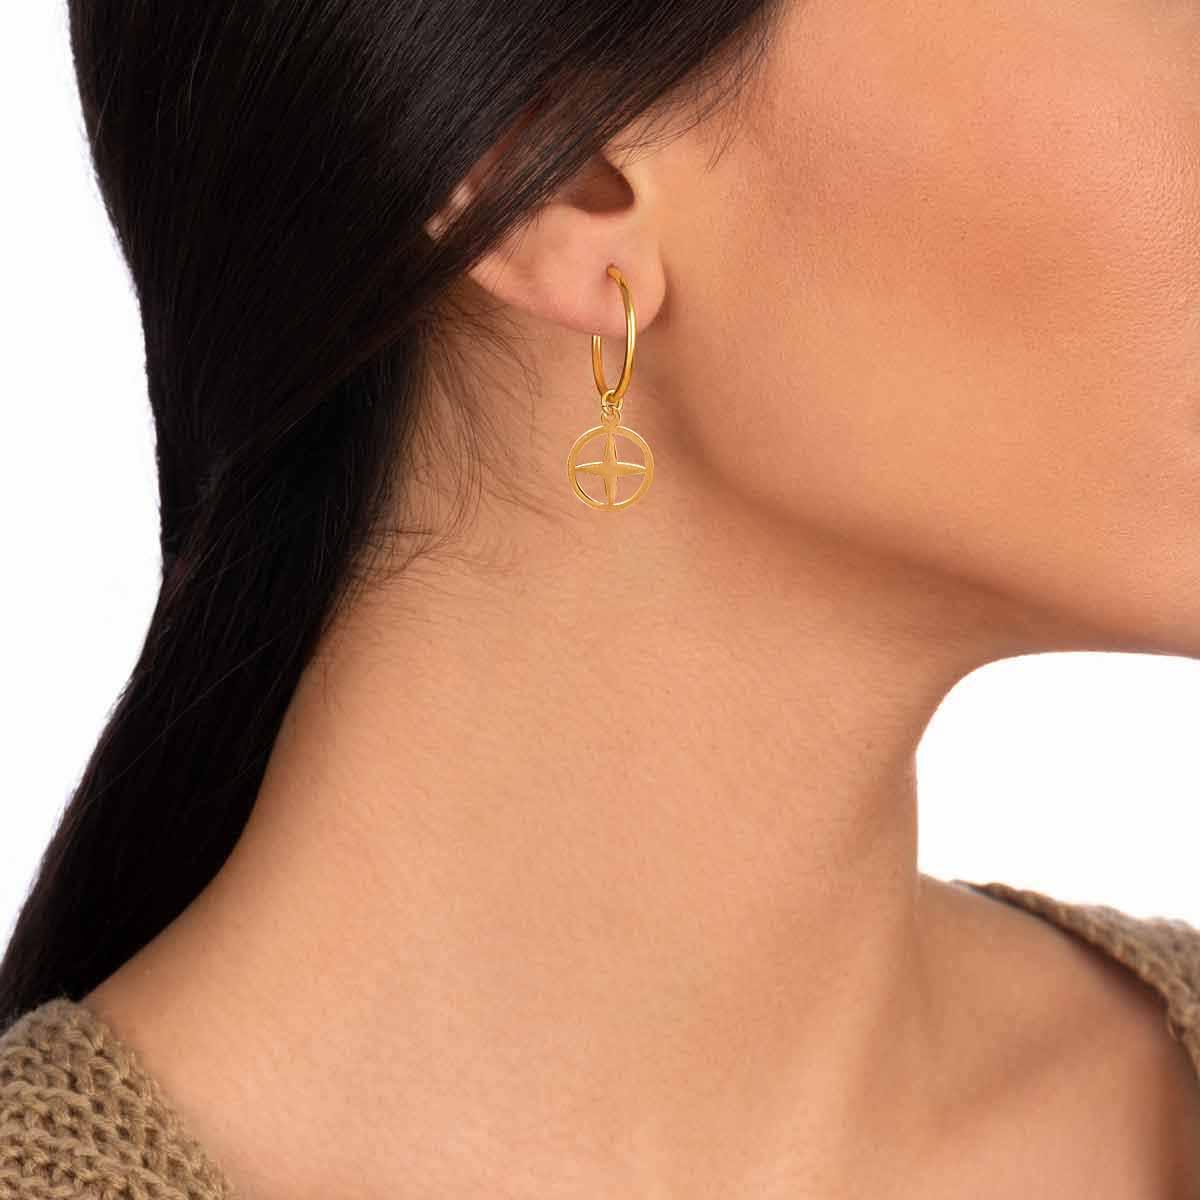 گوشواره طلا حلقه ای آفتاب